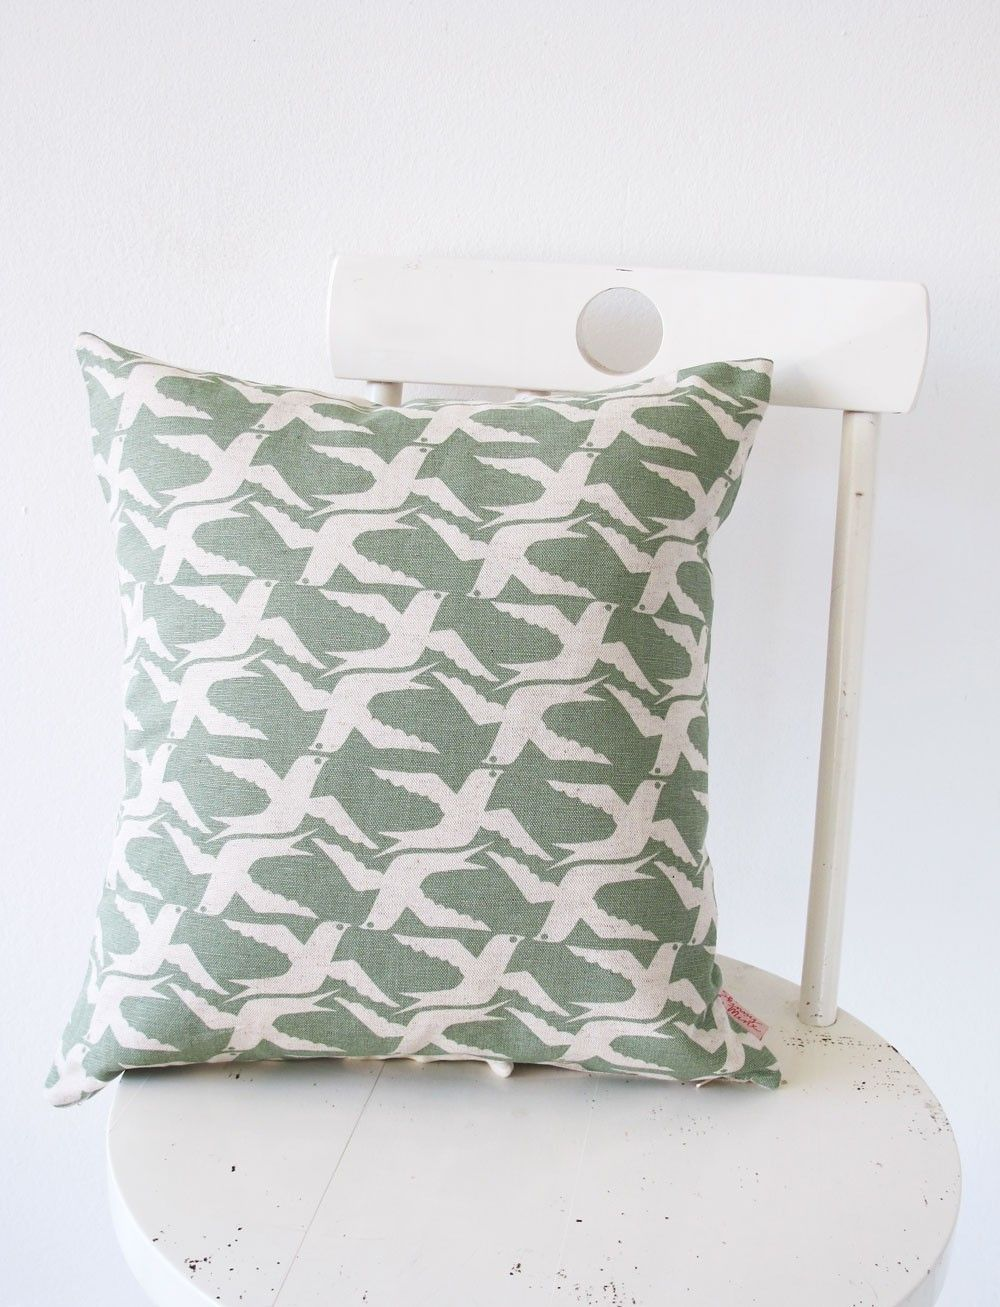 Cushion cover xcm cloudbirds in verdigris by skinnylaminx